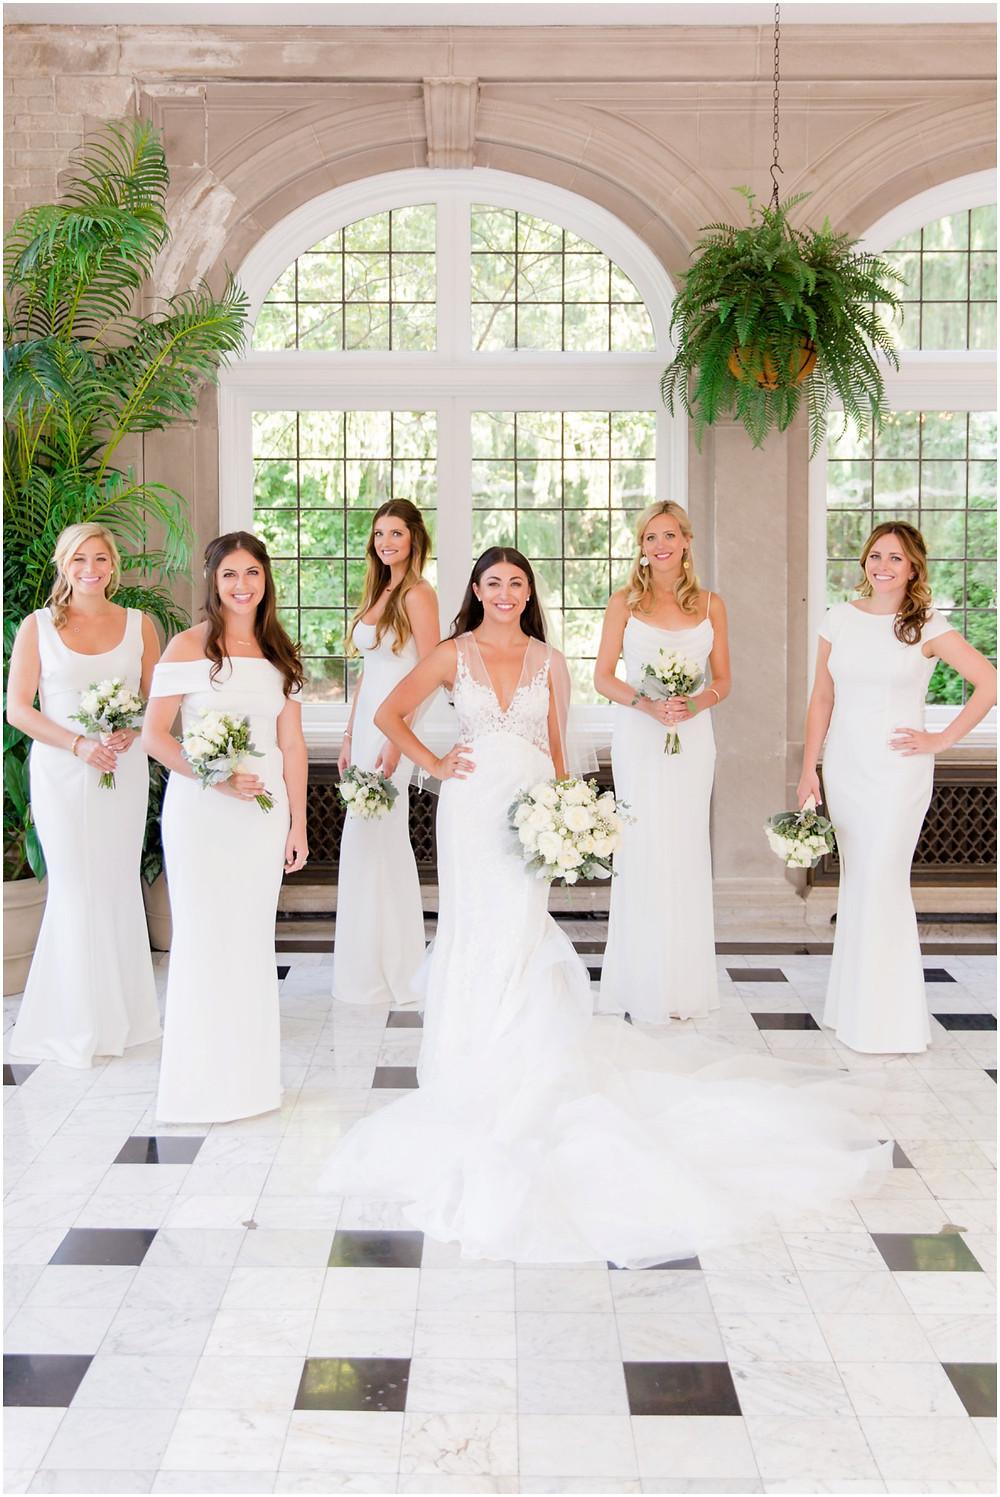 Laurel Hall Wedding reception